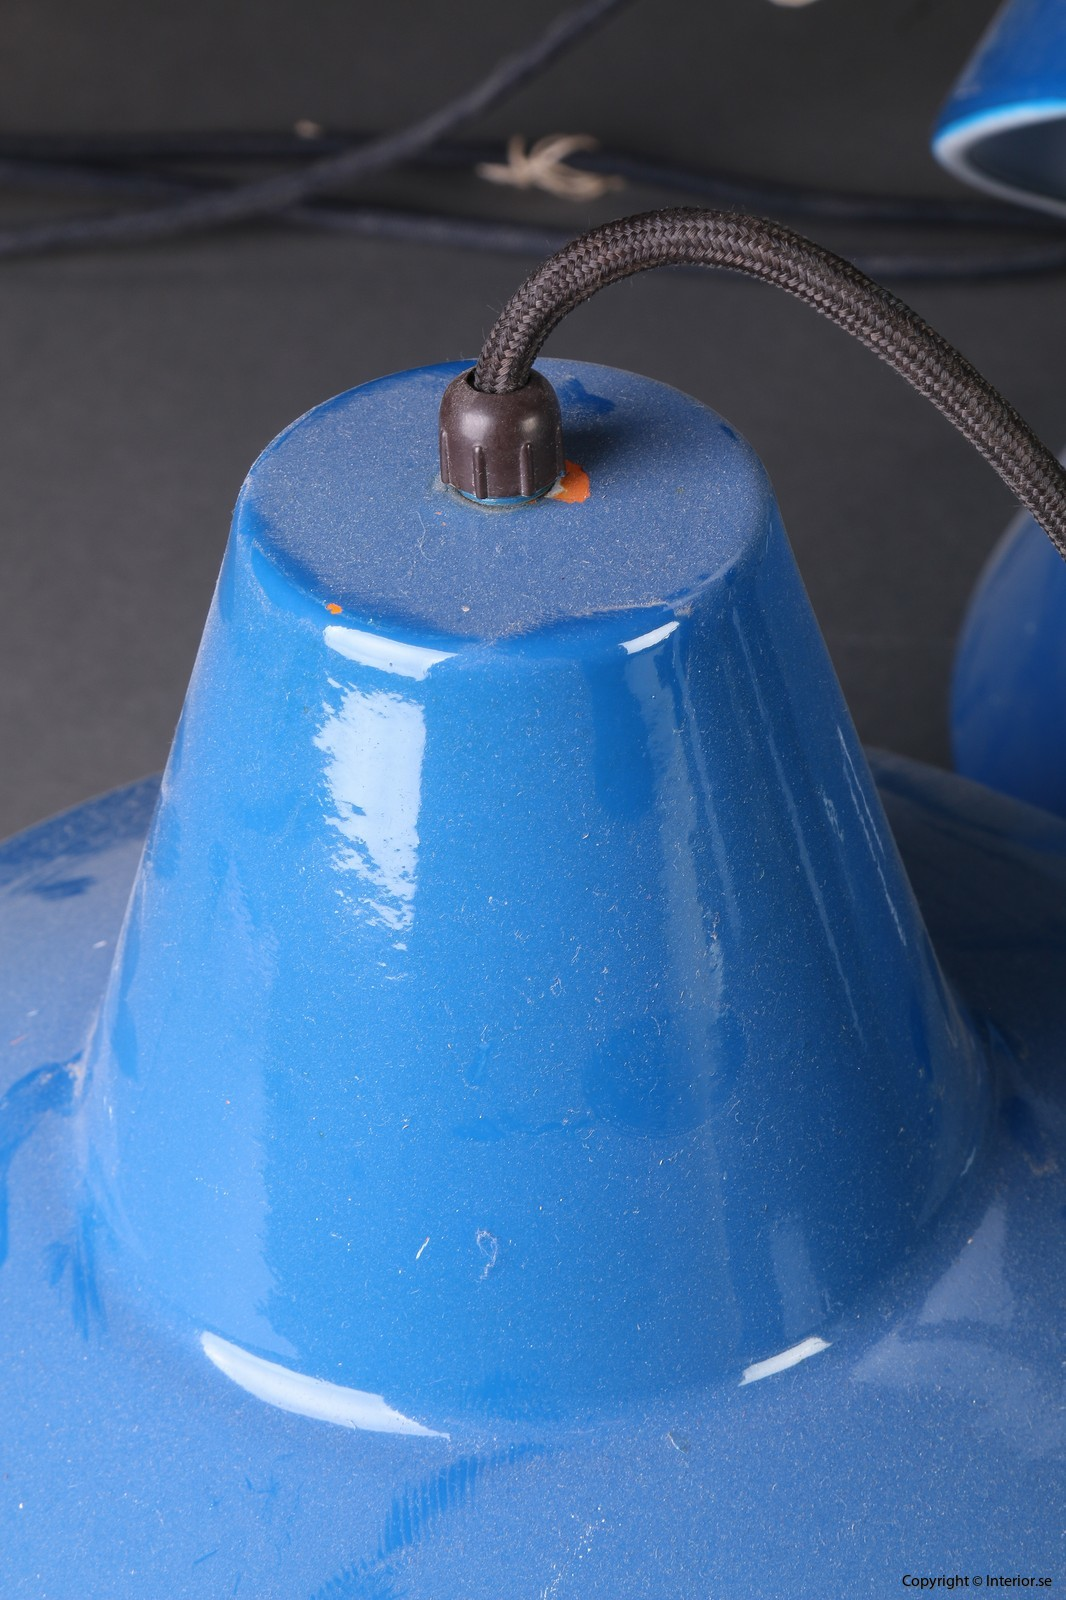 Louis Poulsen Industri lampor - Blå Industri industry design 3